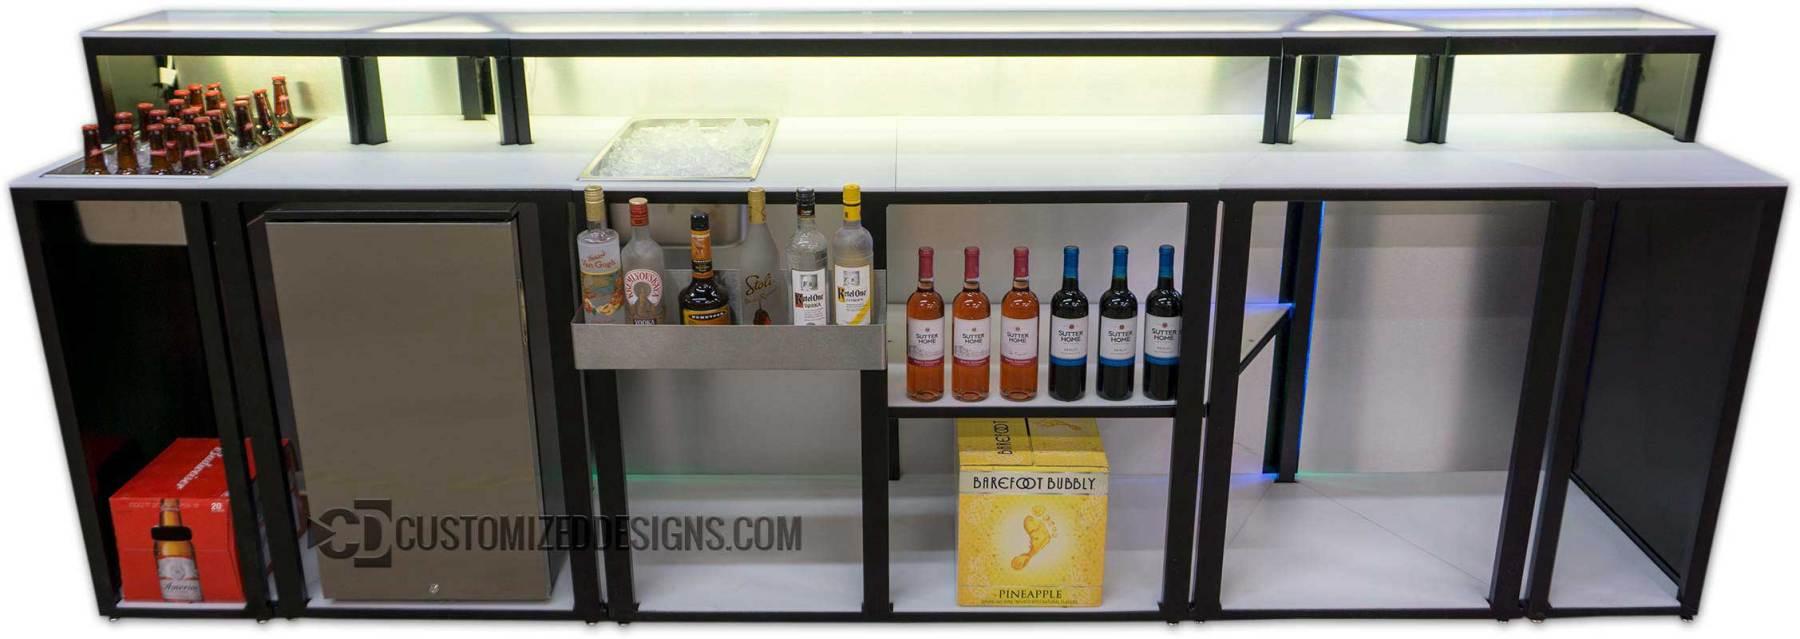 Commercial Portable Bar